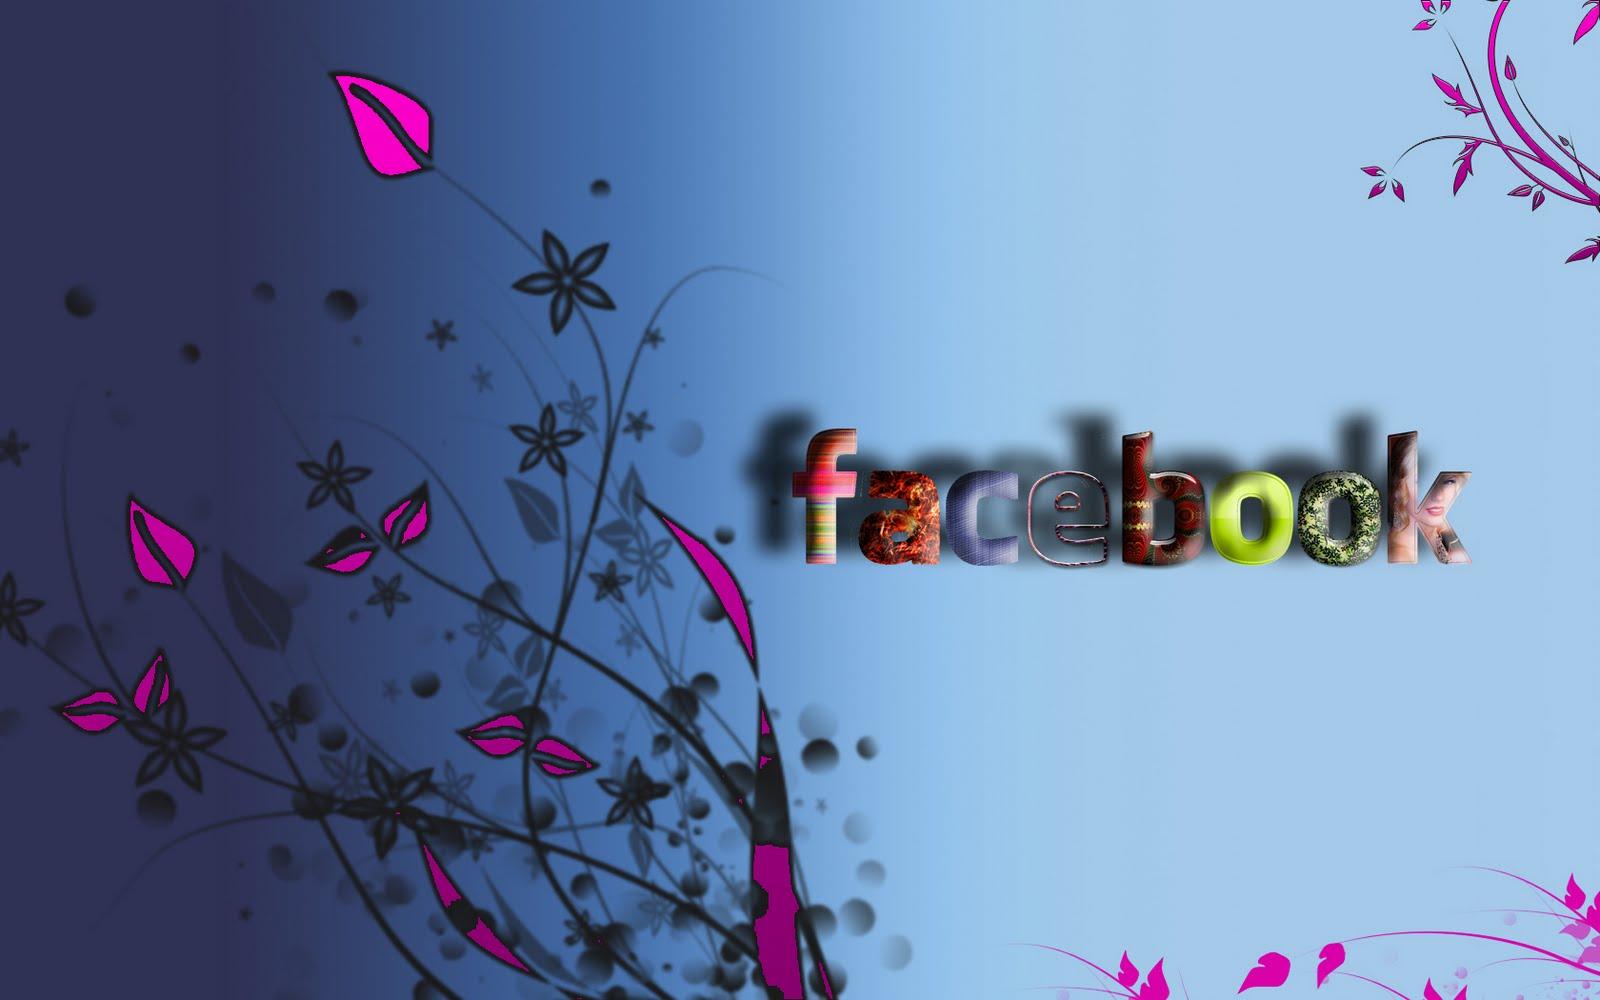 http://4.bp.blogspot.com/-wS3L1mwJzfY/TWV8vvzWkJI/AAAAAAAAA_Q/KRsf96tEcMM/s1600/facebook_wallpaper%2B%2525281%252529.jpg